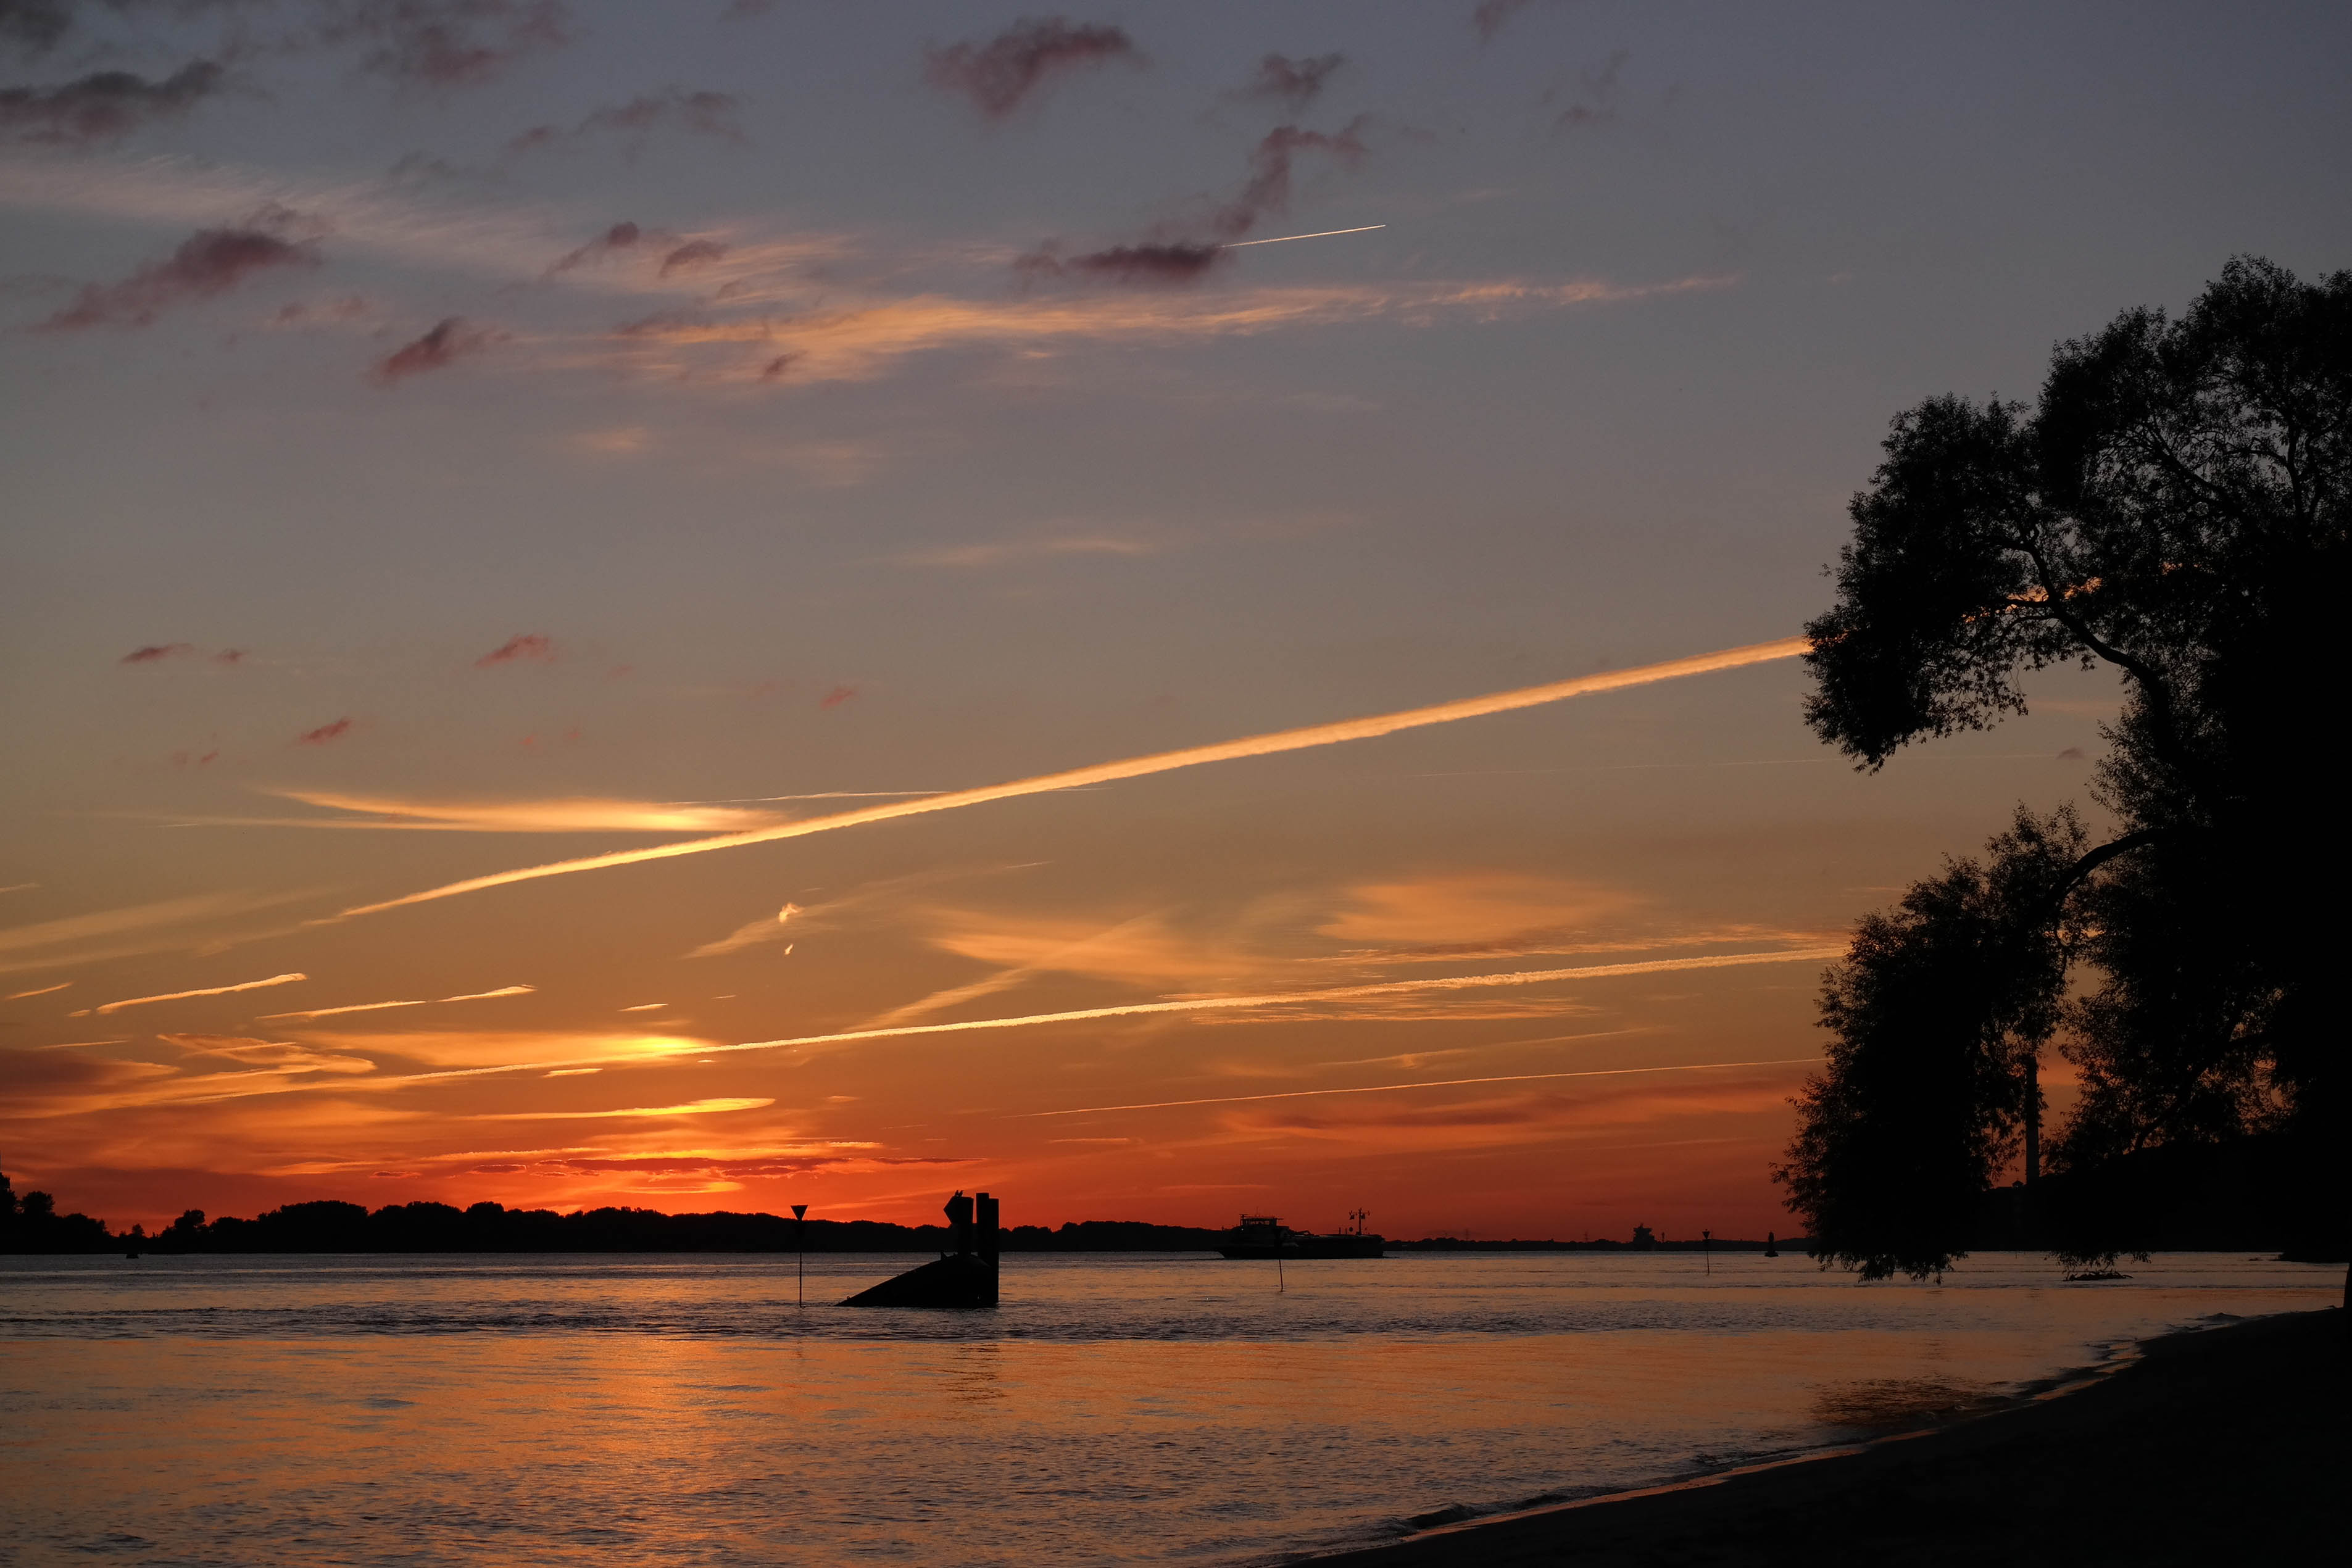 Sonneuntergang an der Elbe in Hamburg